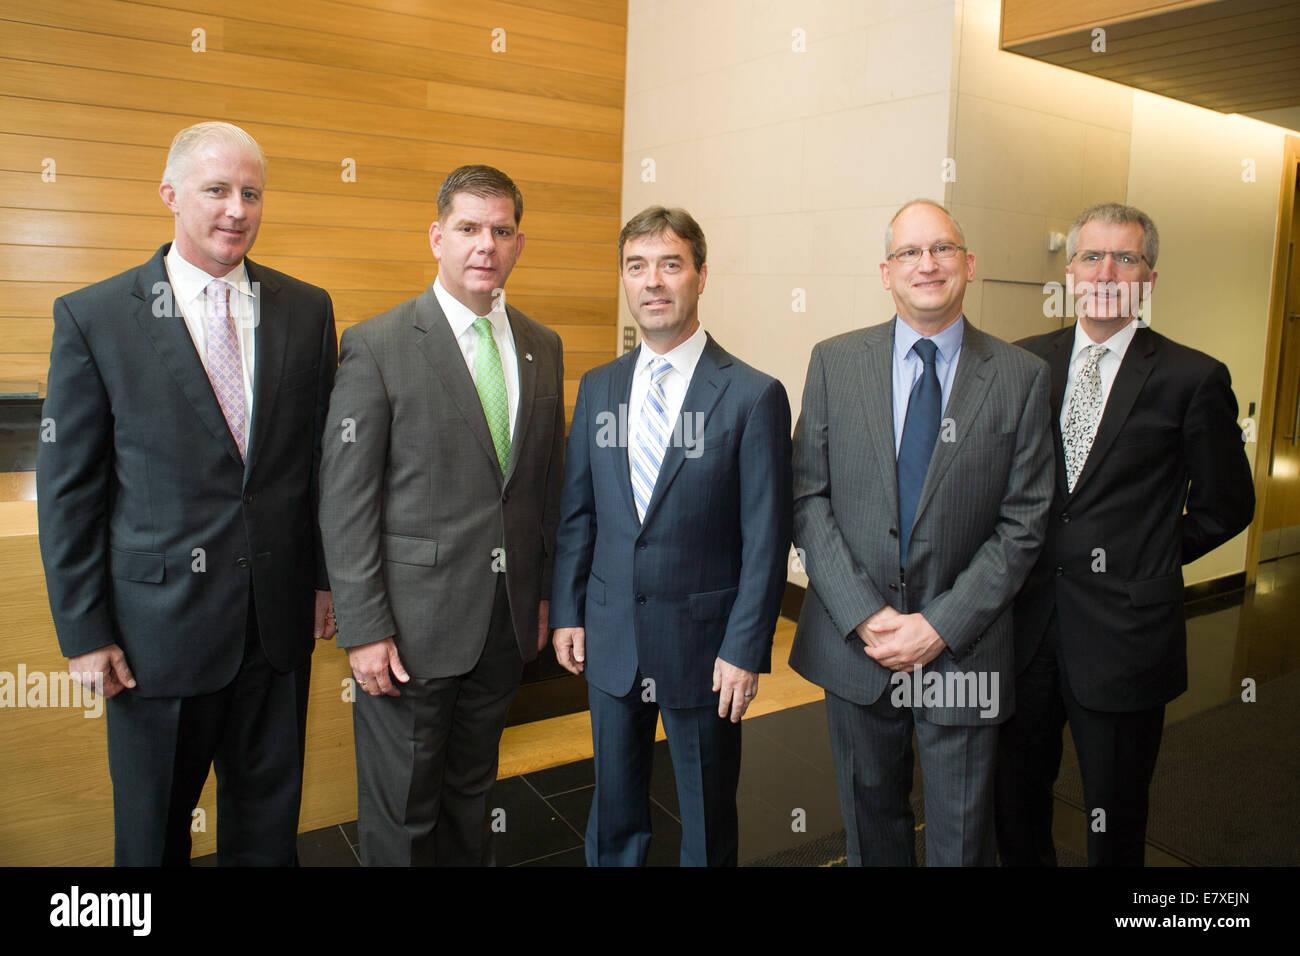 Belfast, Ireland. 25th September, 2014. Mayor of Boston Martin J Walsh (2nd Left) visited Liberty IT in Belfast - Stock Image